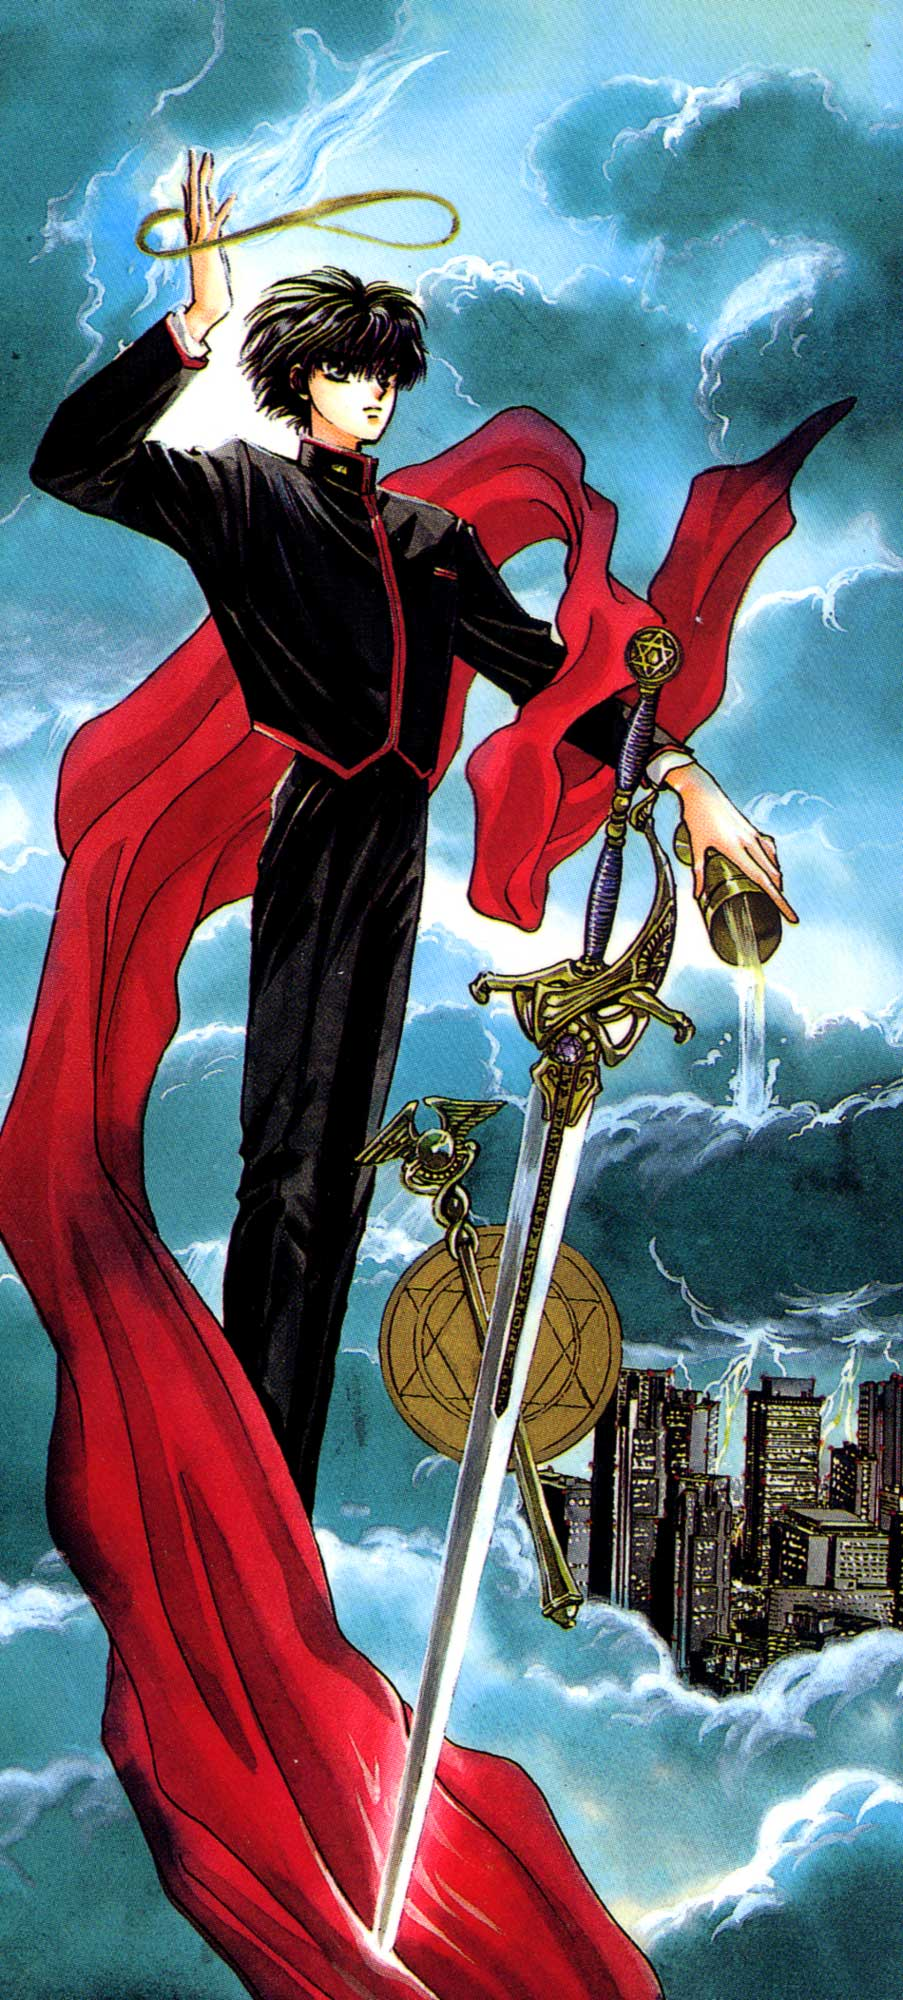 Shirou Kamui X Image 281104 Zerochan Anime Image Board